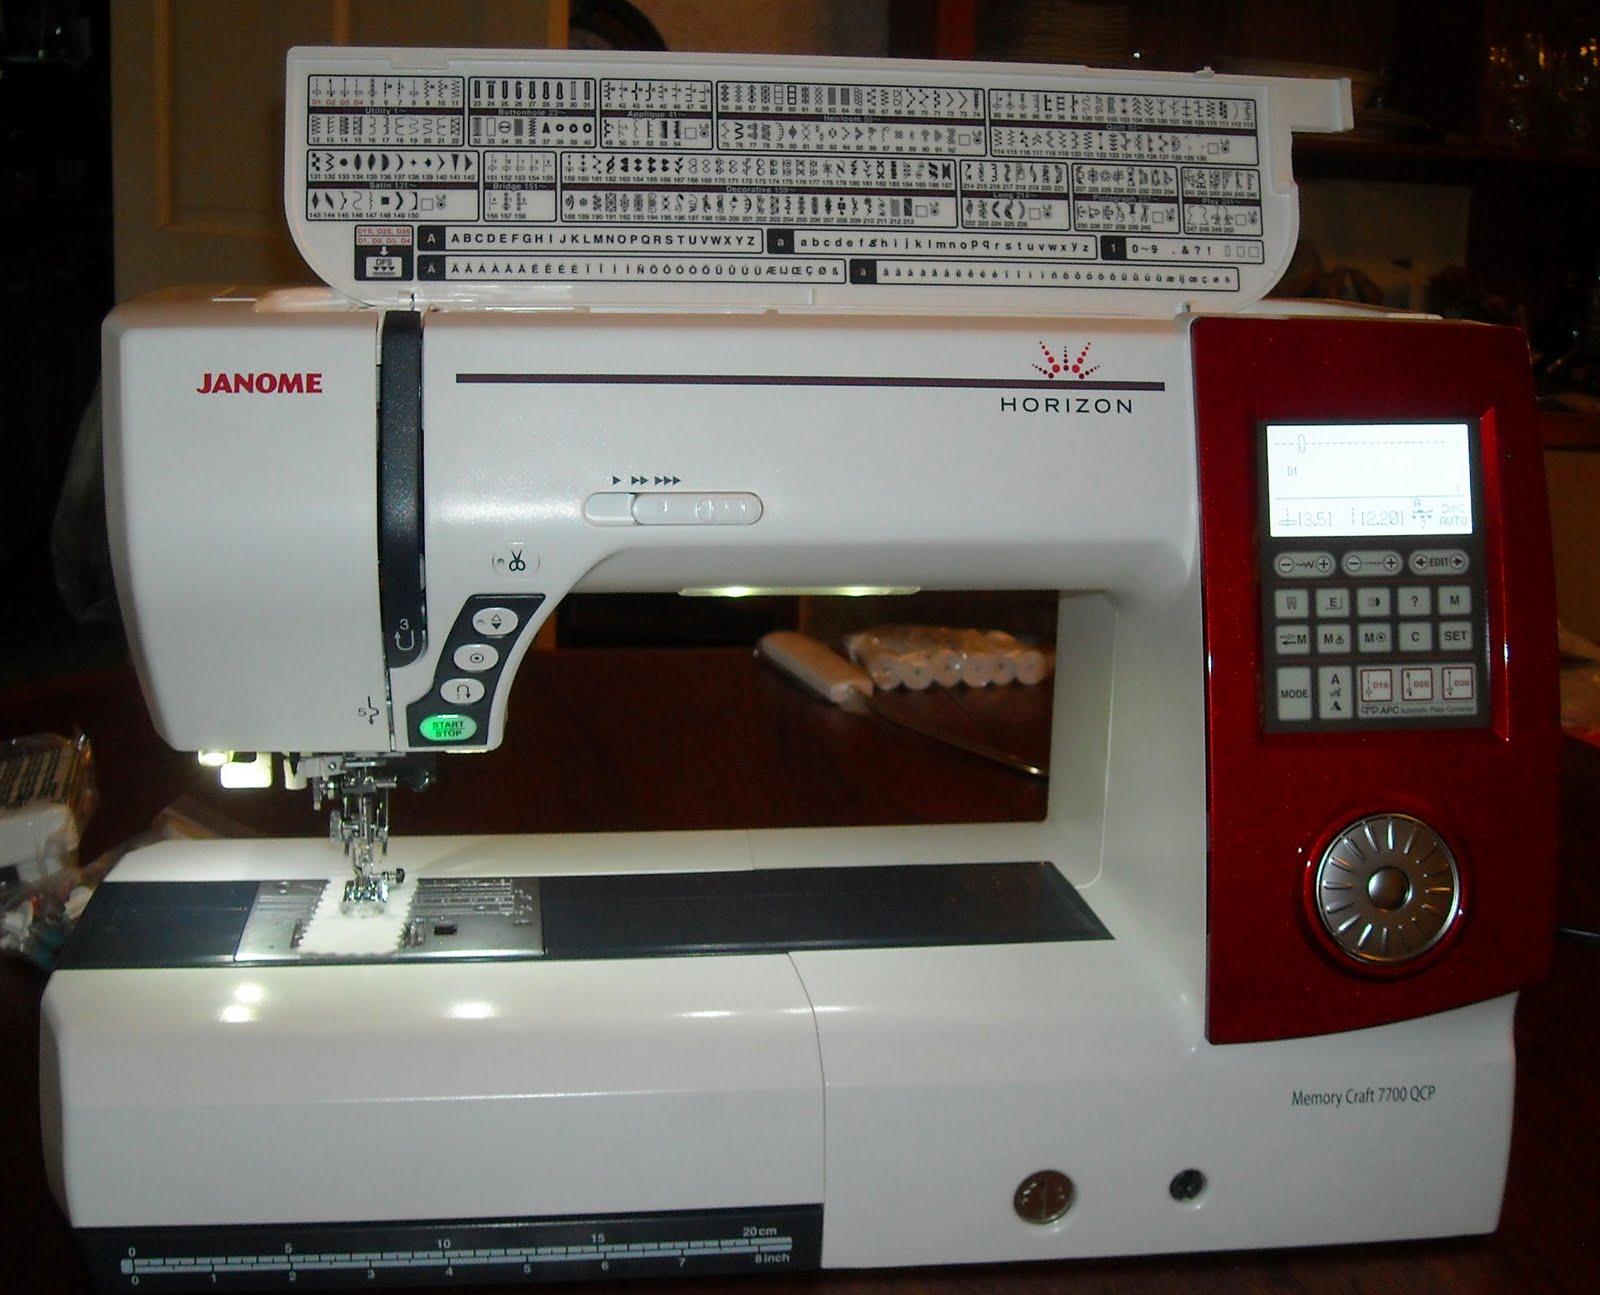 Janome Horizon Memory Craft 7700QCP Instruction Manual